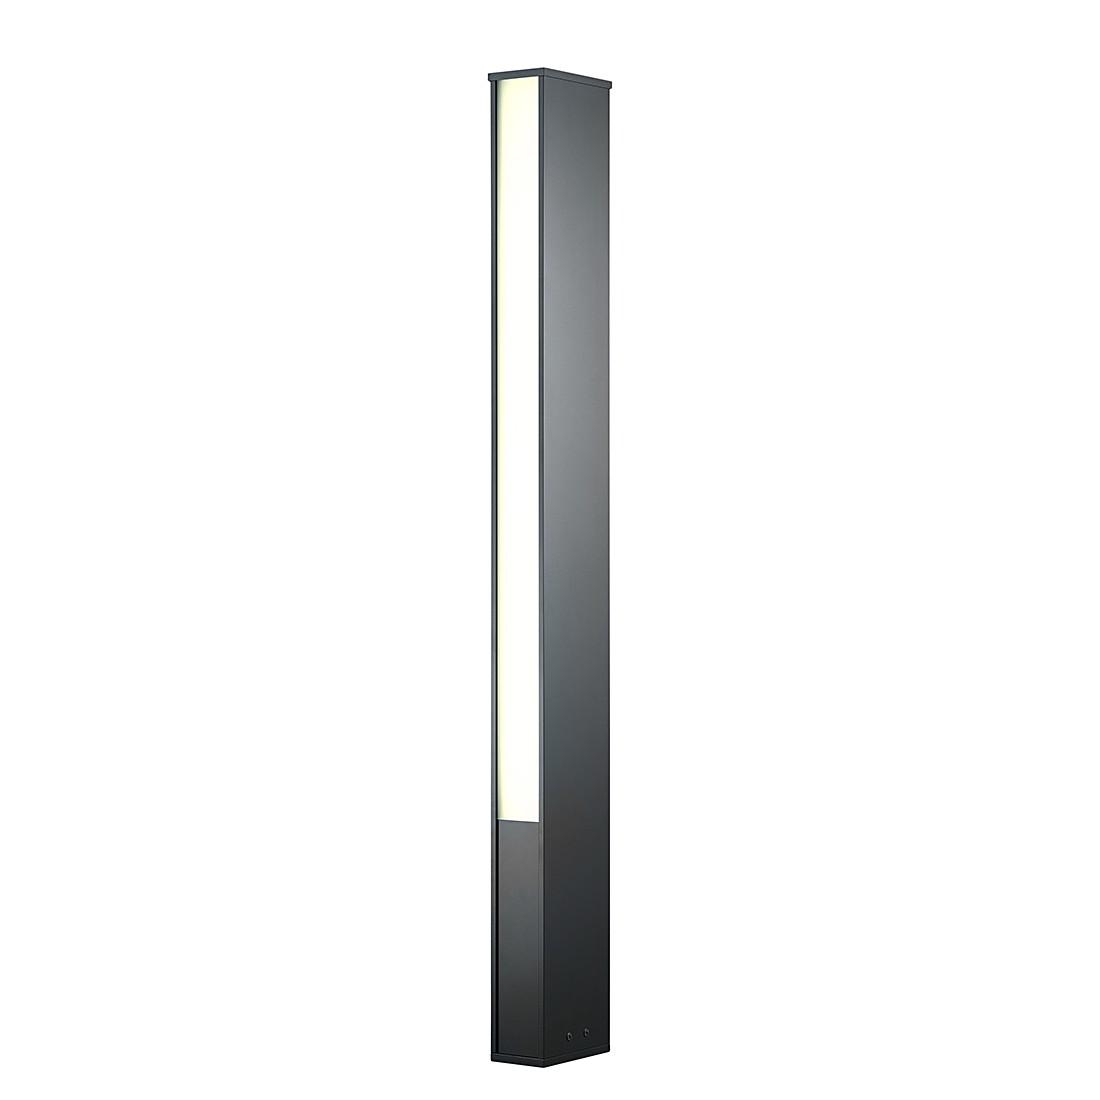 Außenleuchte TENDO LED ● Metall/Kunststoff ● Silber- Helestra A+